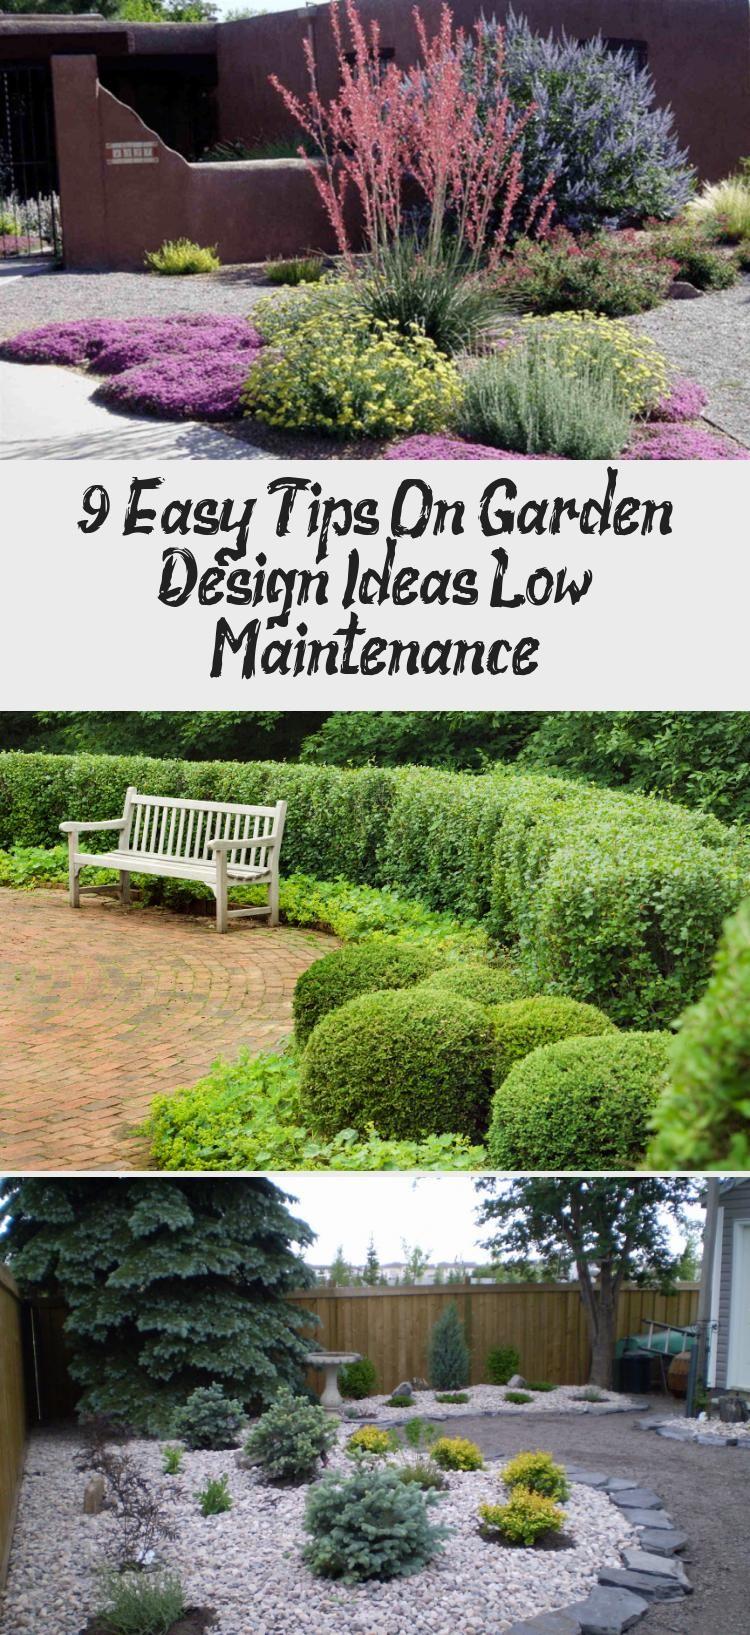 9 Easy Tips On Garden Design Ideas Low Maintenance | Low ...